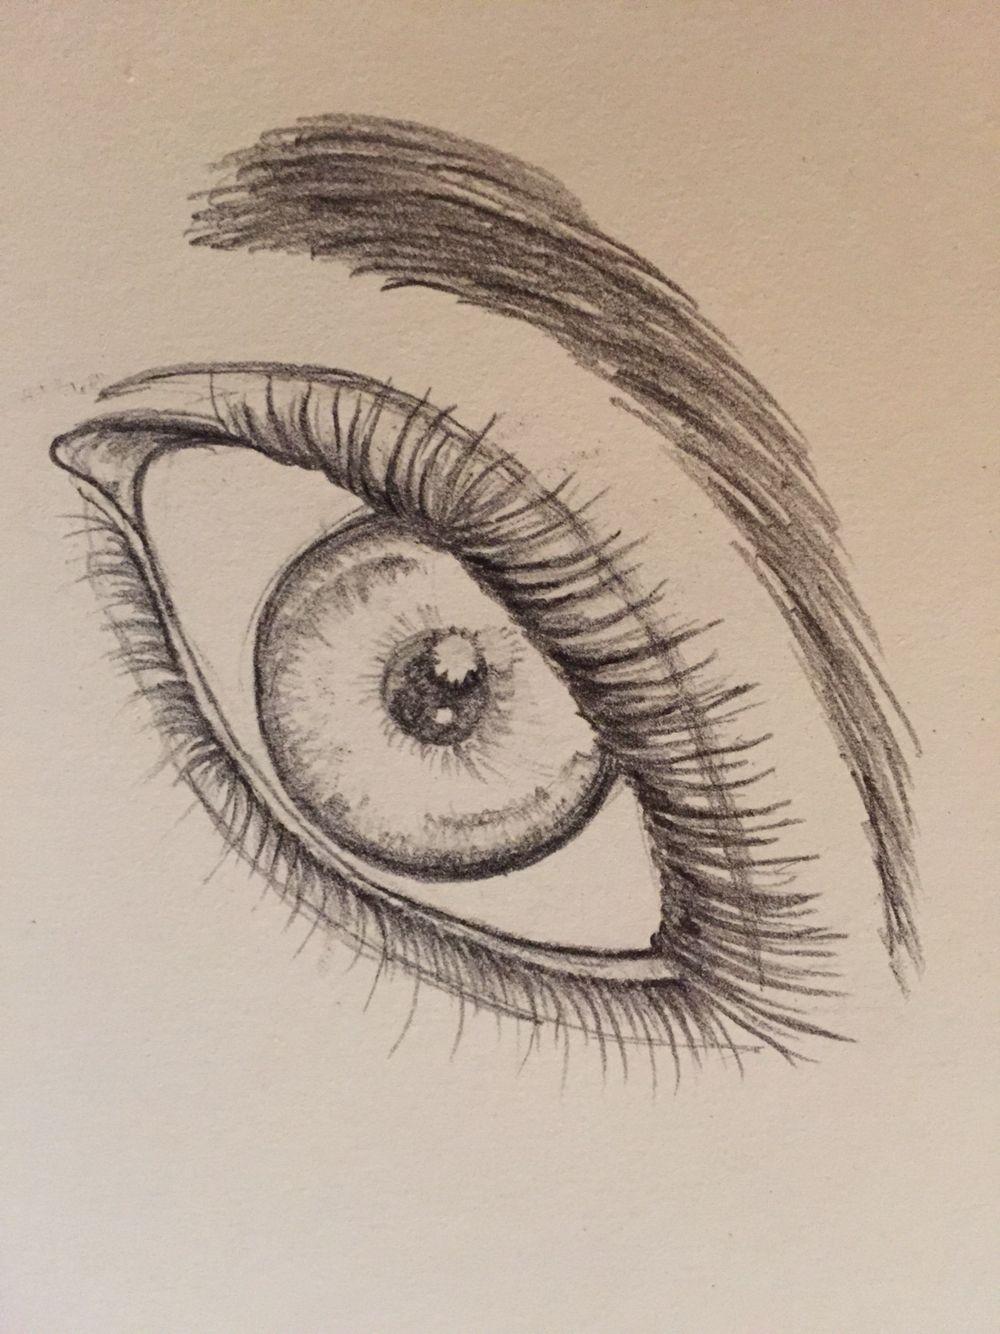 Quick eye pencil sketch eye pencil sketch drawing ideas art drawings doodles